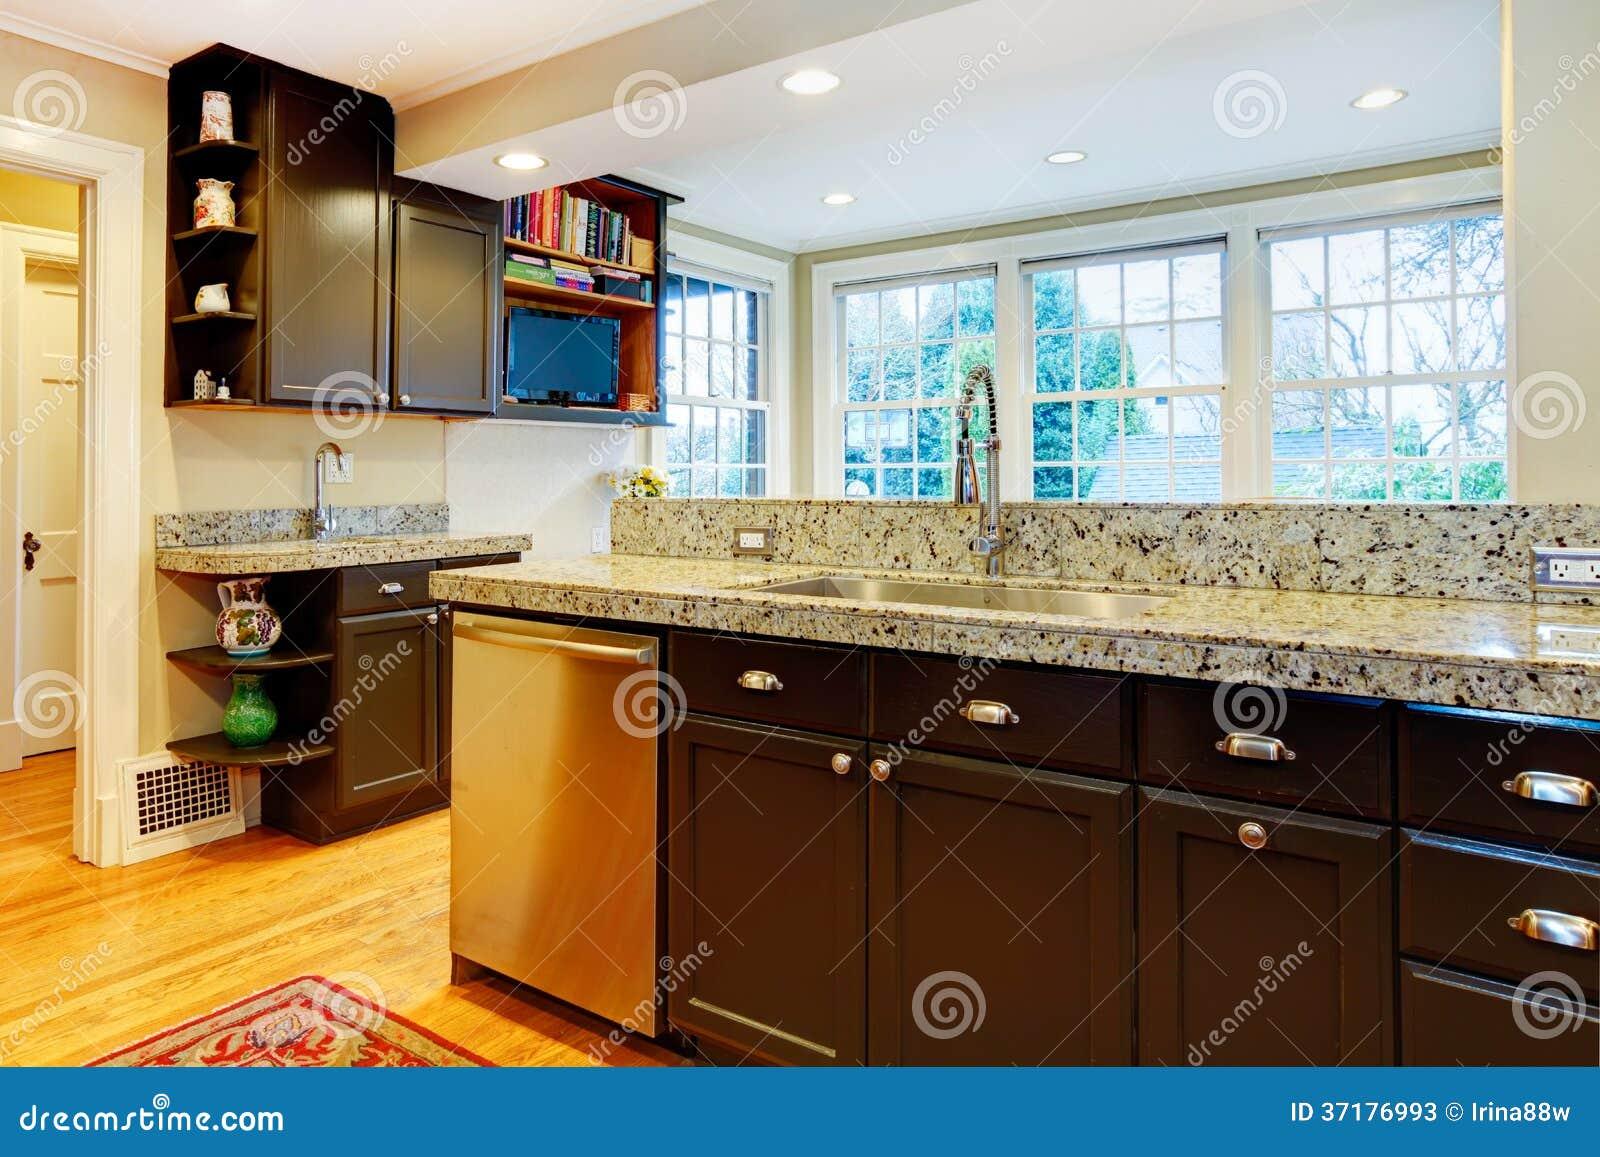 Dise o de la cocina gabinetes de madera negros encimera for Gabinetes de madera para cocina pequena